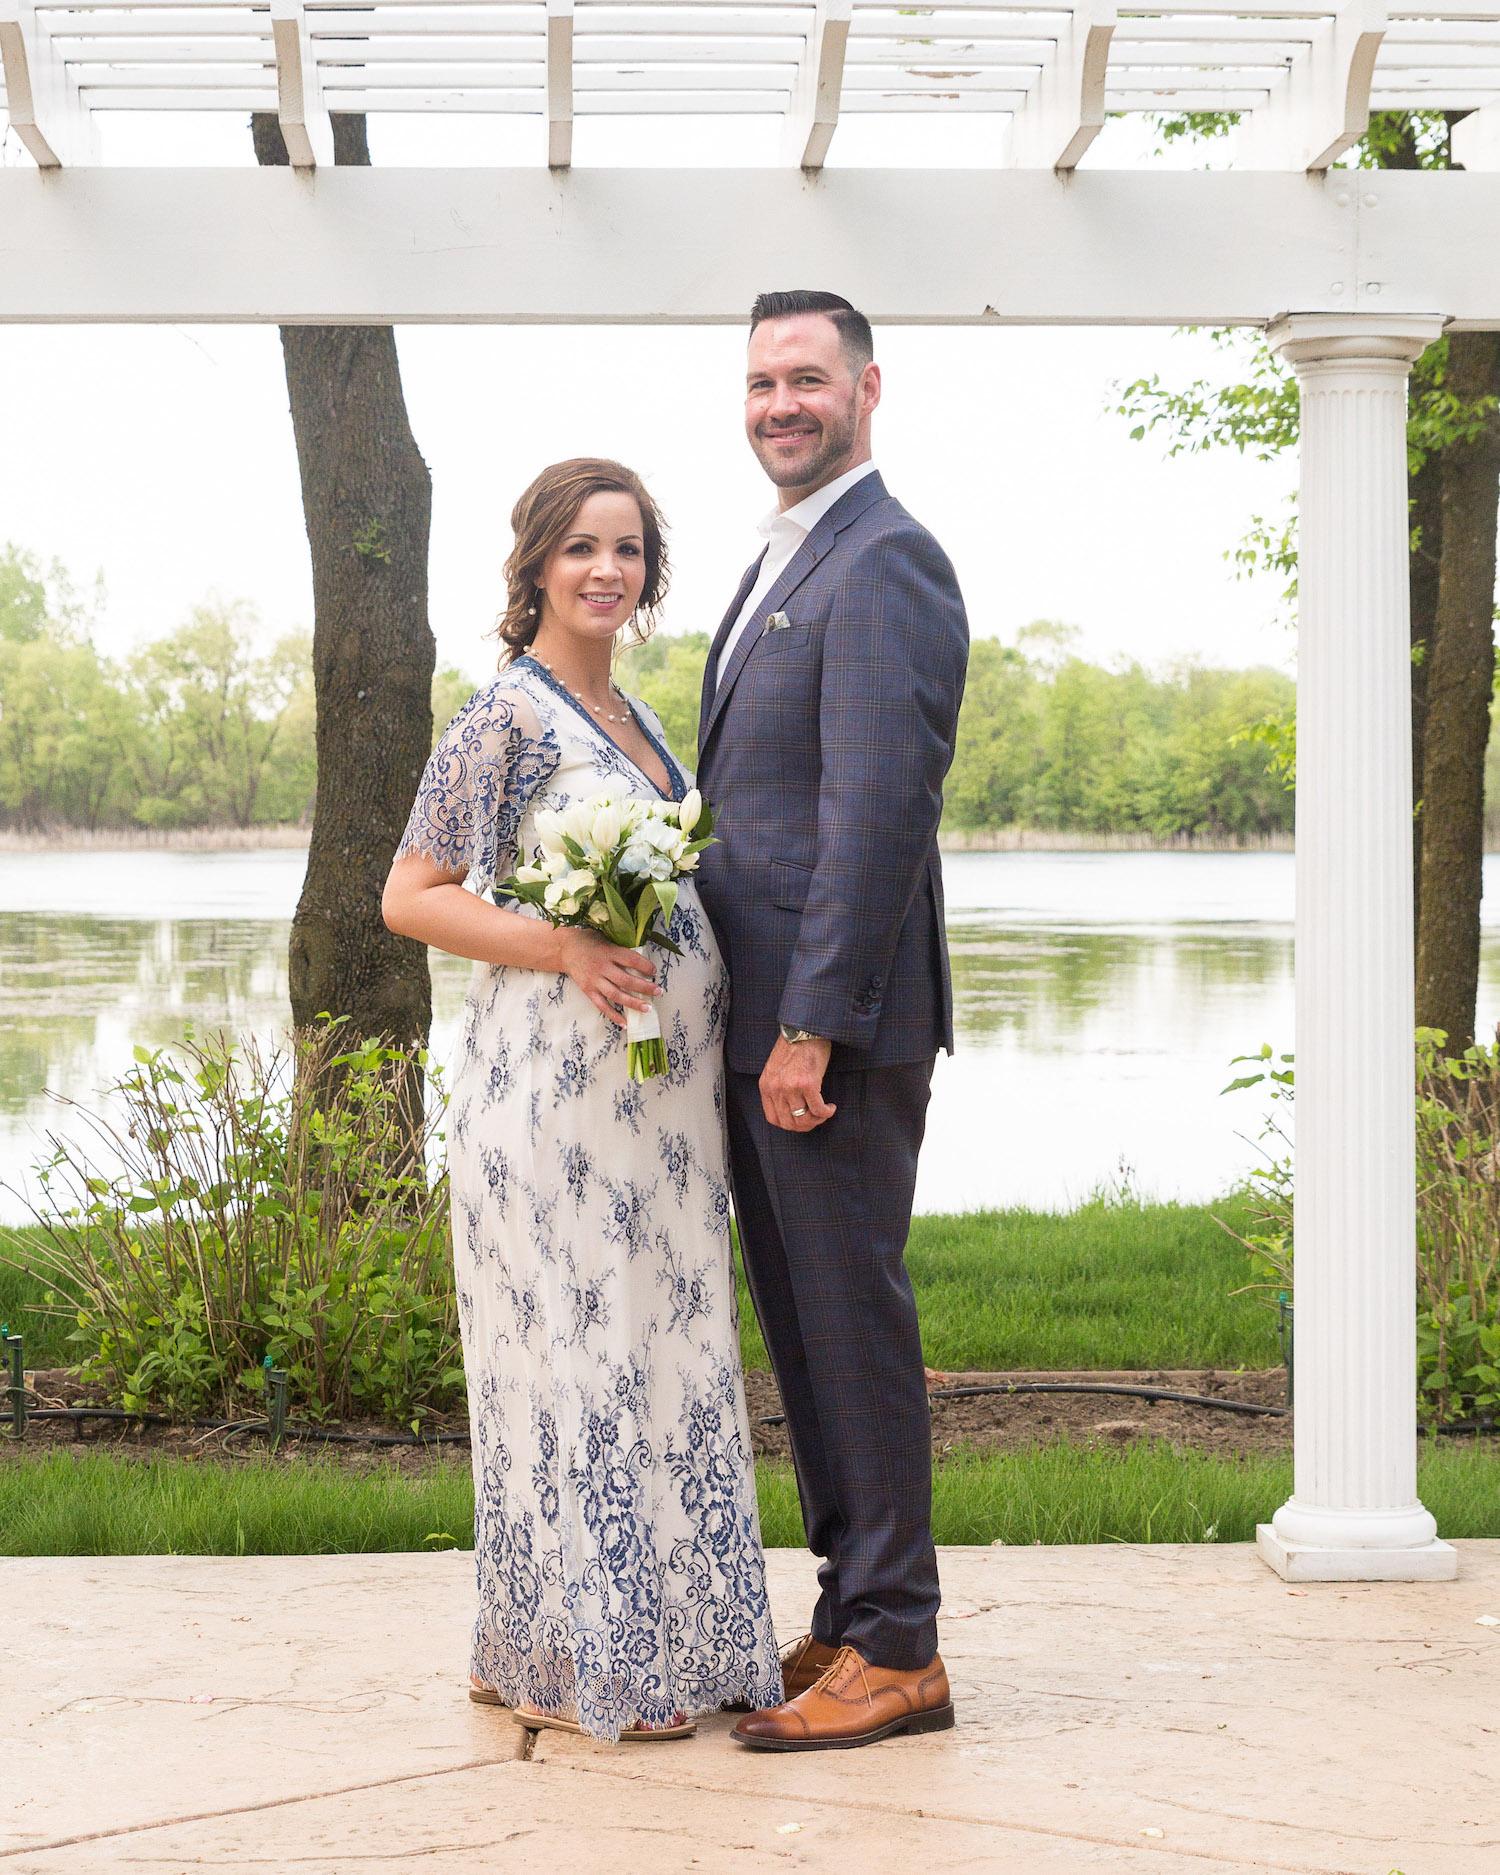 Cindyrella's Garden, pregnant bride in blue and white lace wedding dress, white bouquet